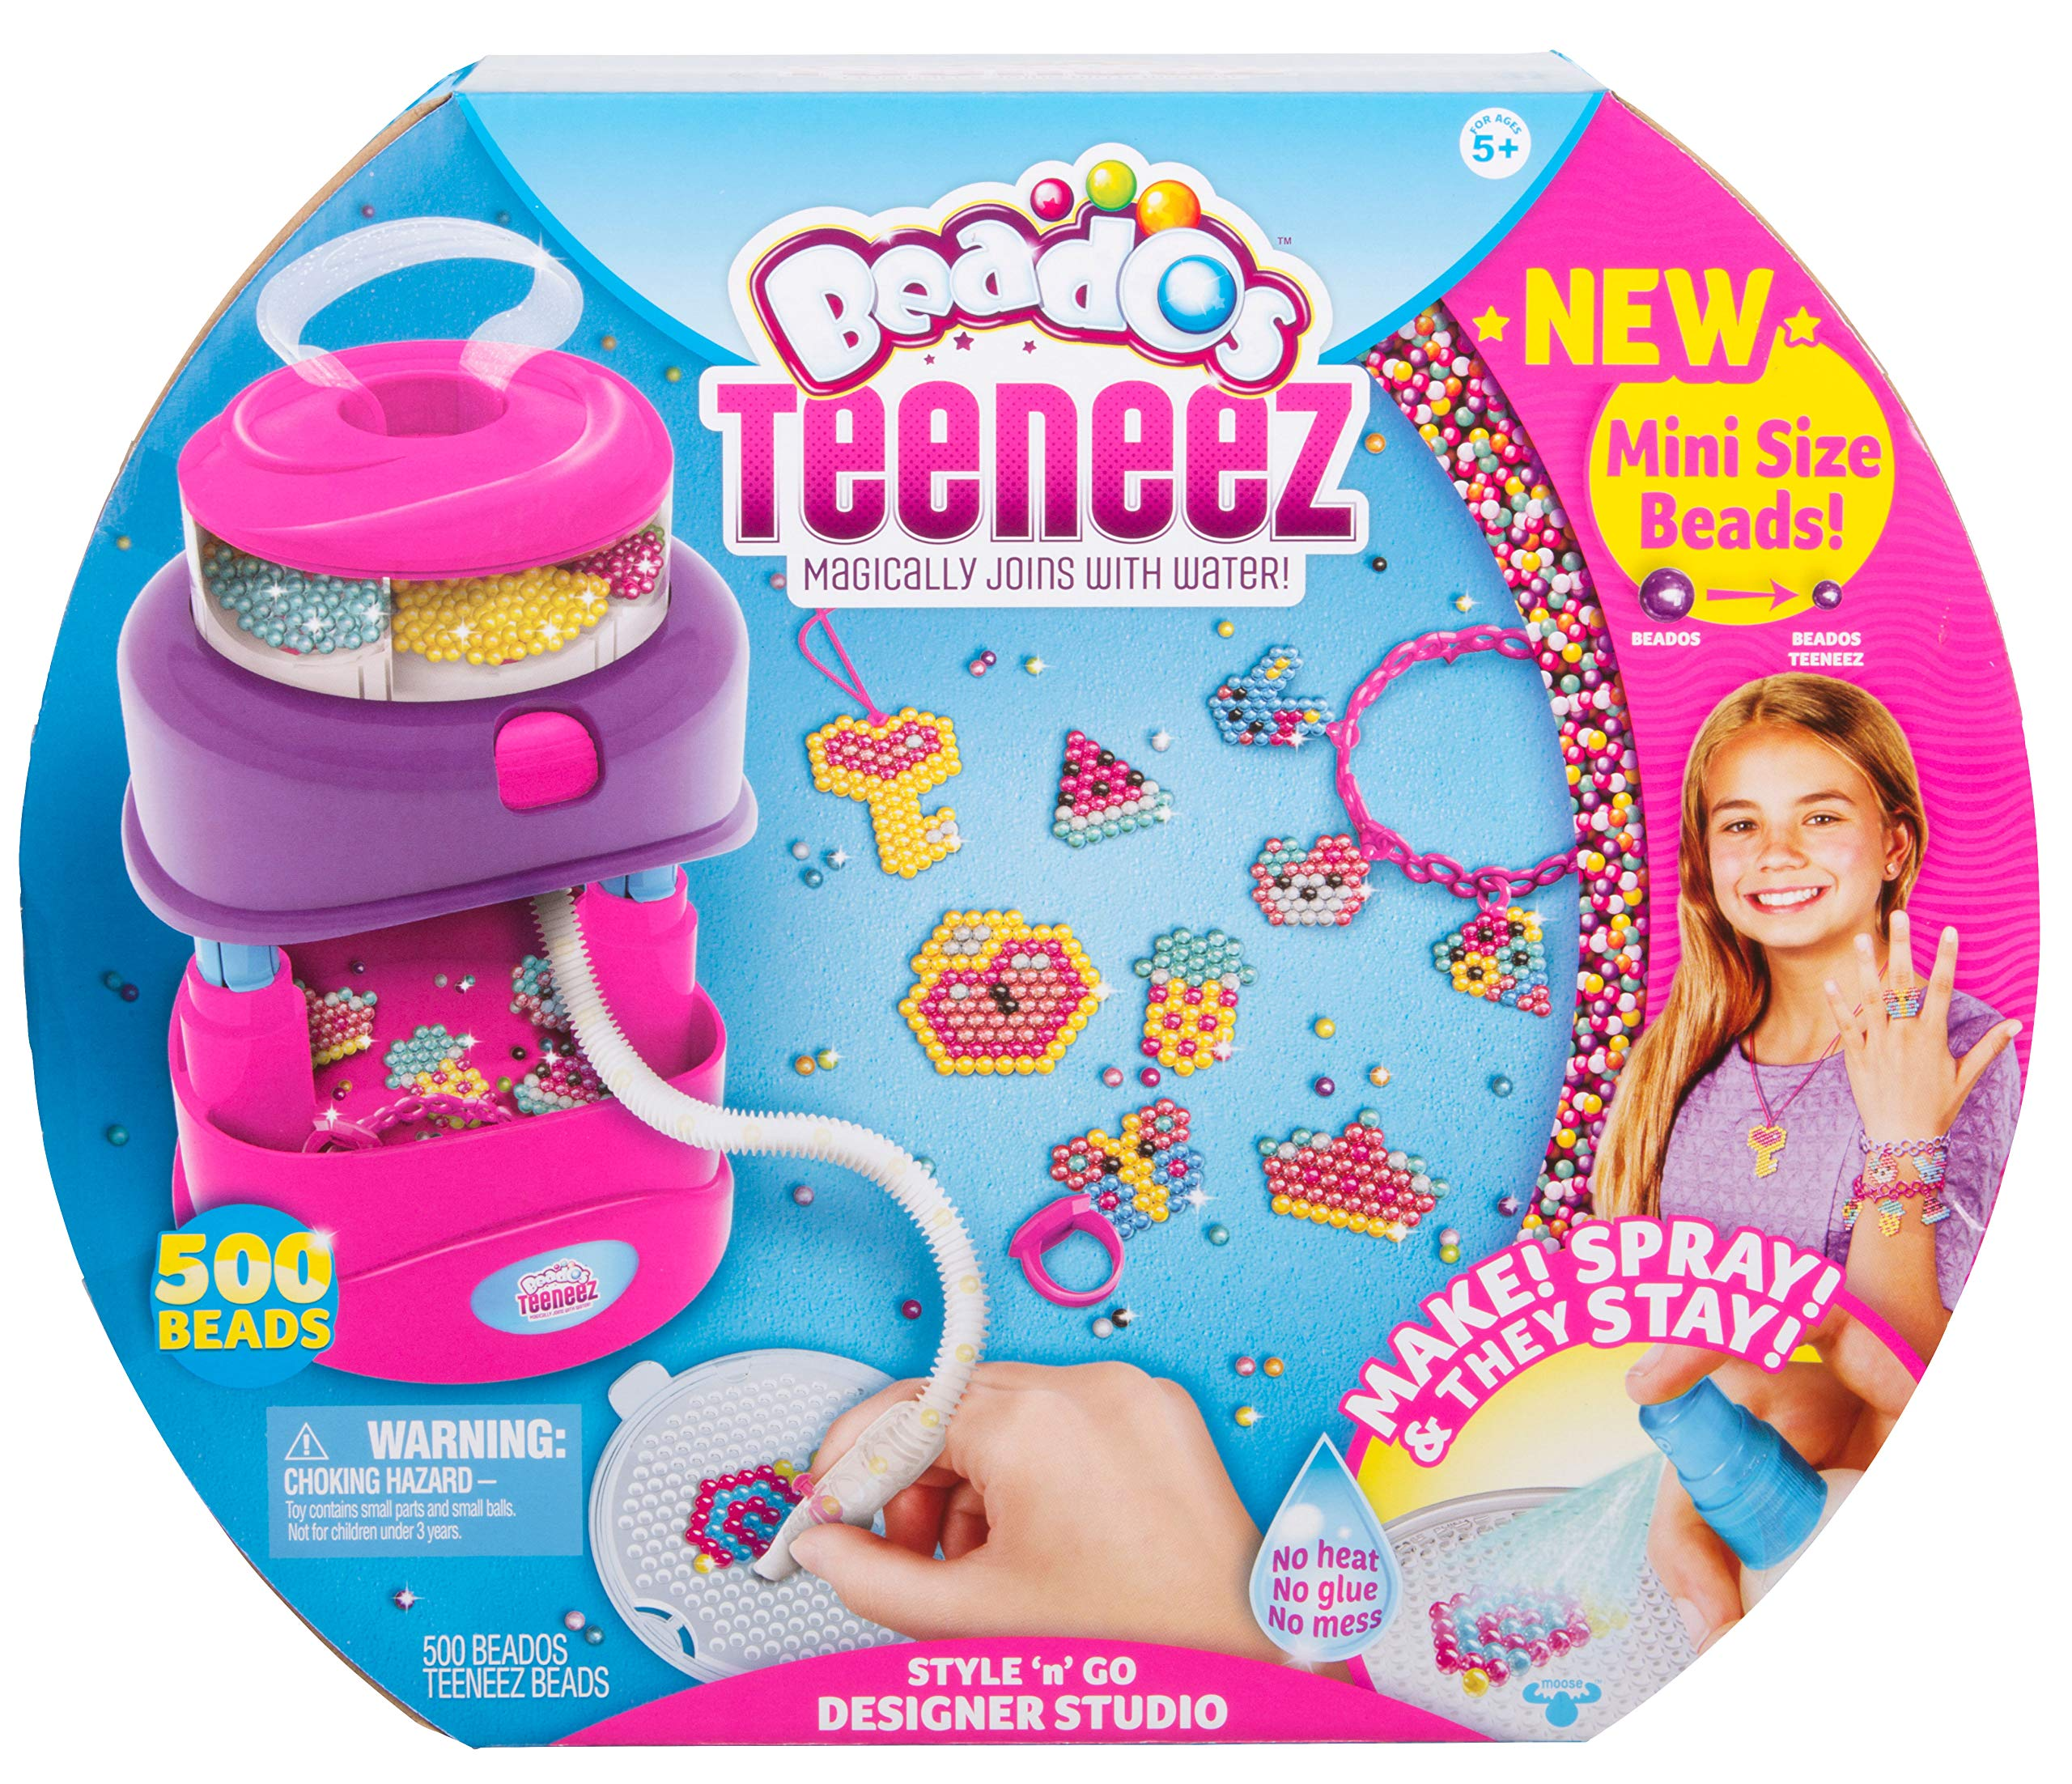 Beados Teeneez Style N Go Designer Studio by Beados Teeneez